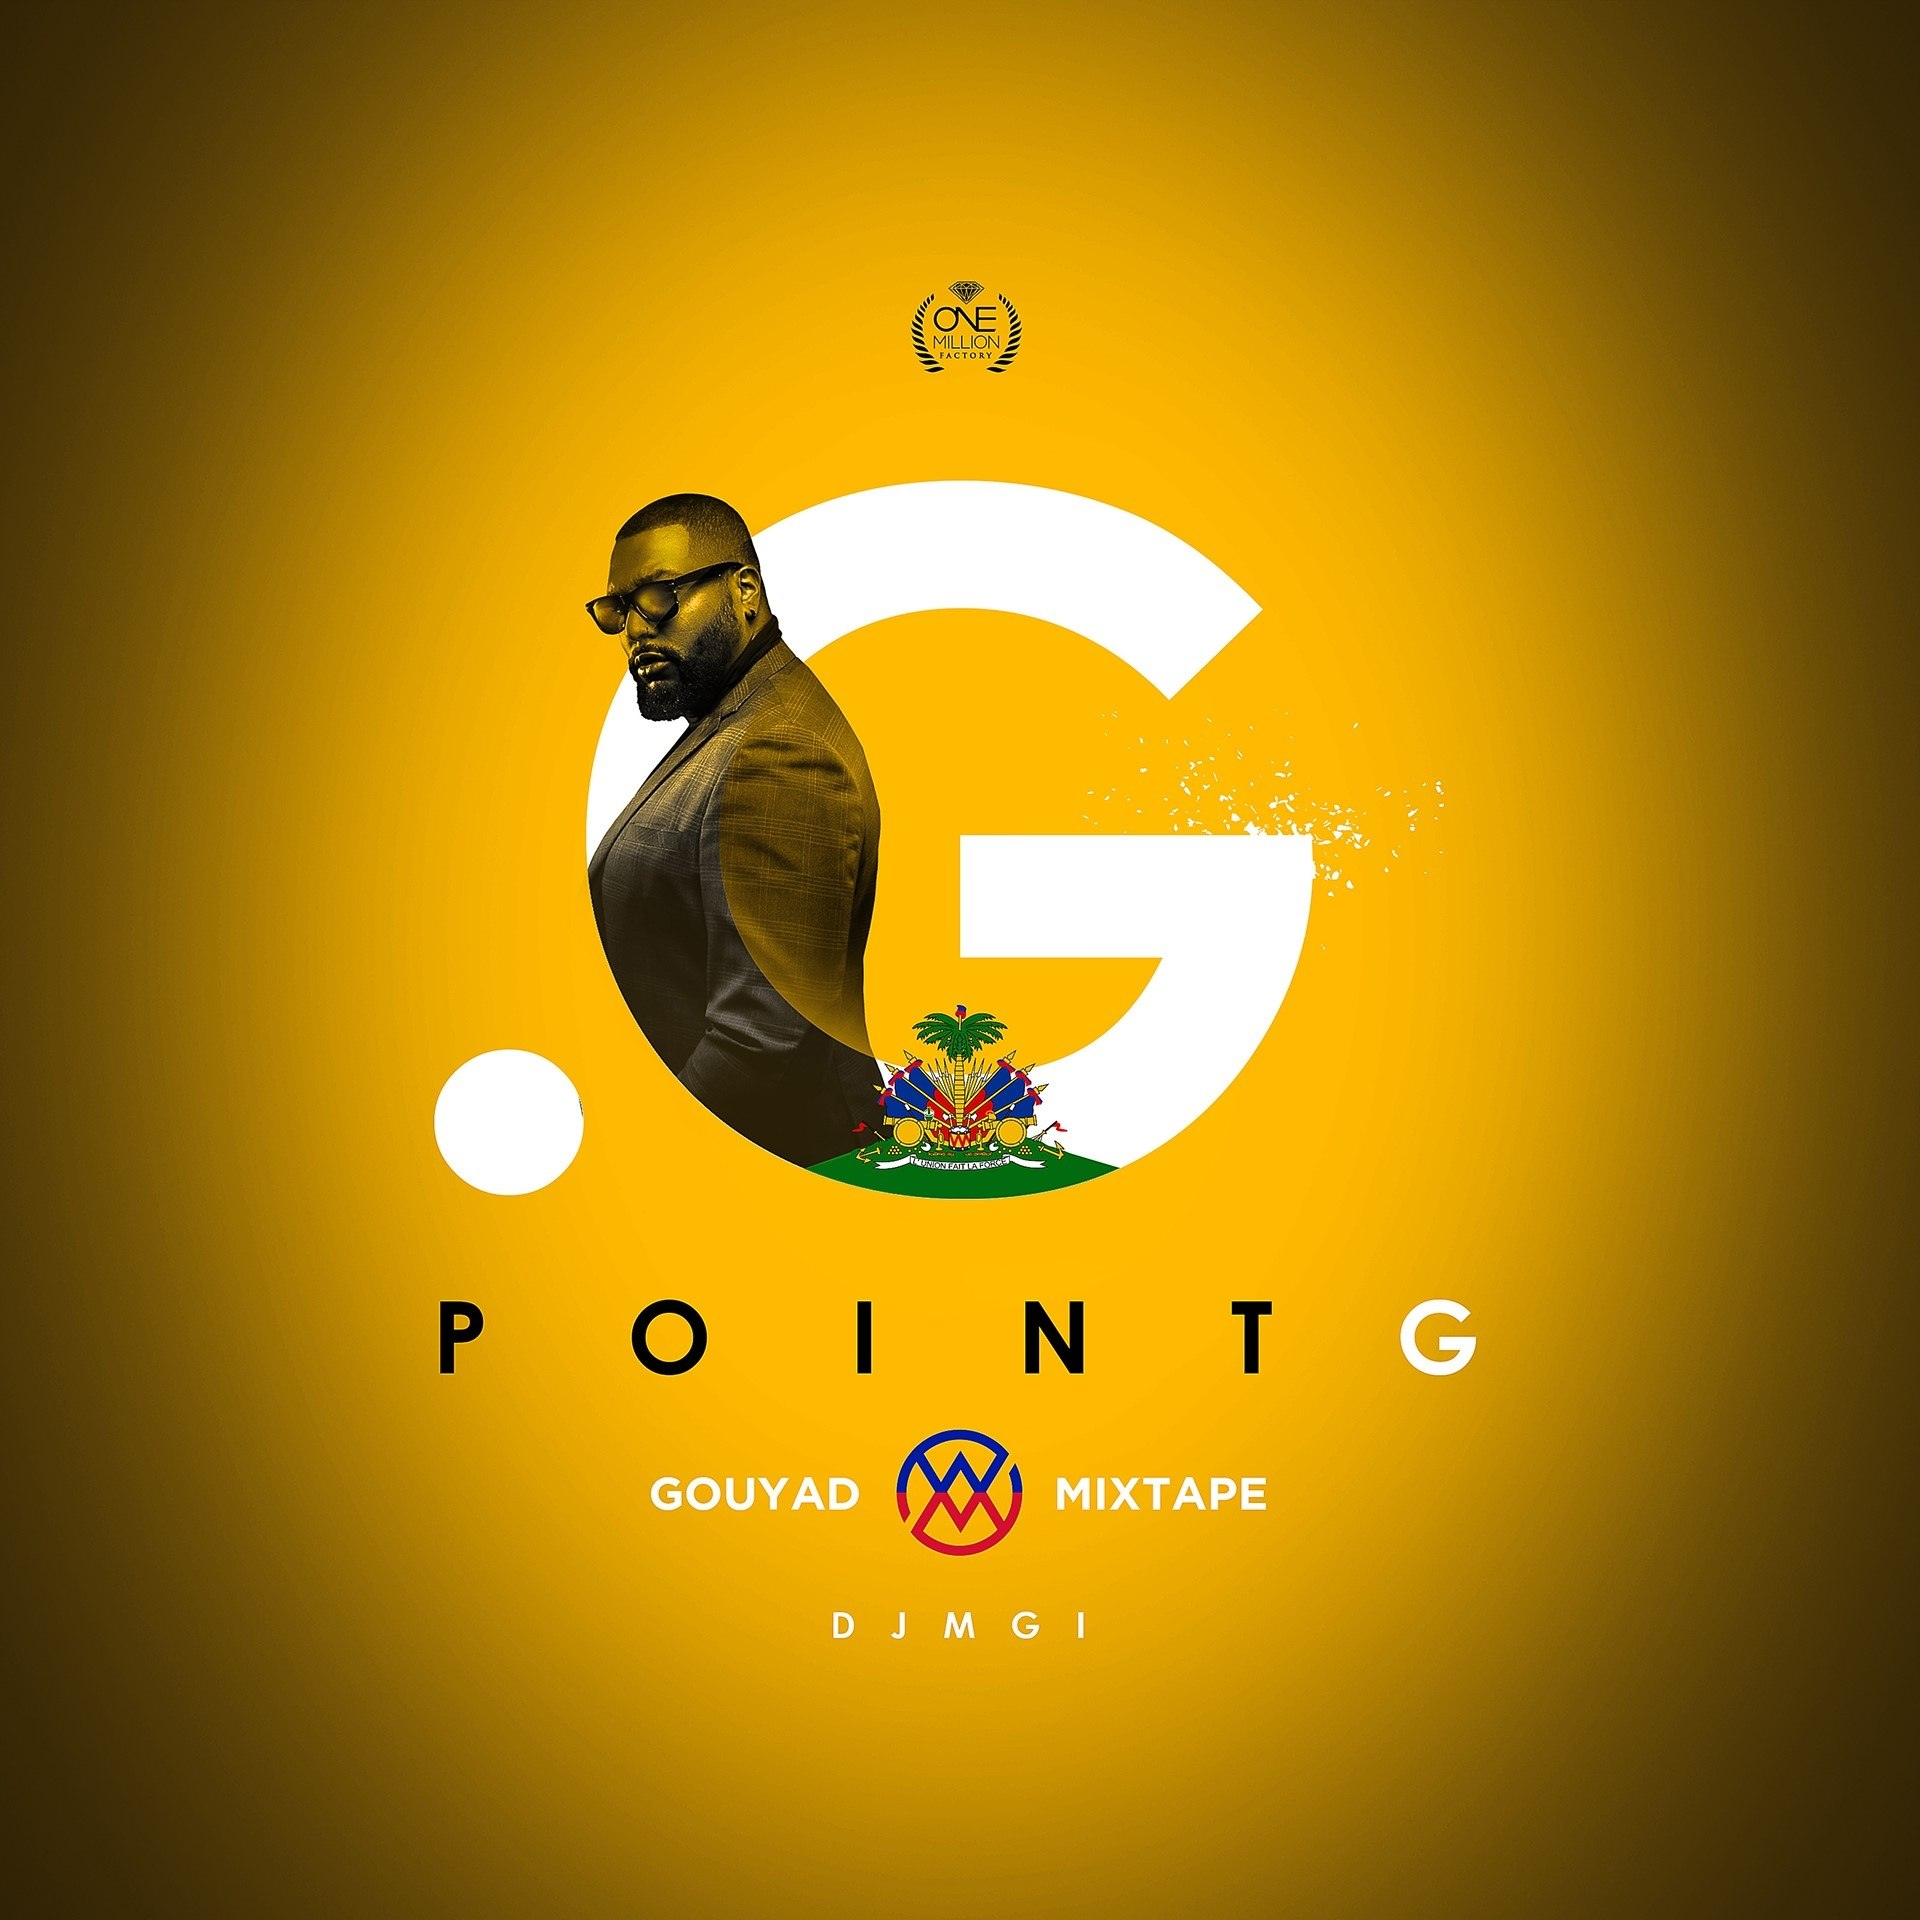 Point G - Dj Mgi - mixtape Kompa Gouyad 2020 - 100min